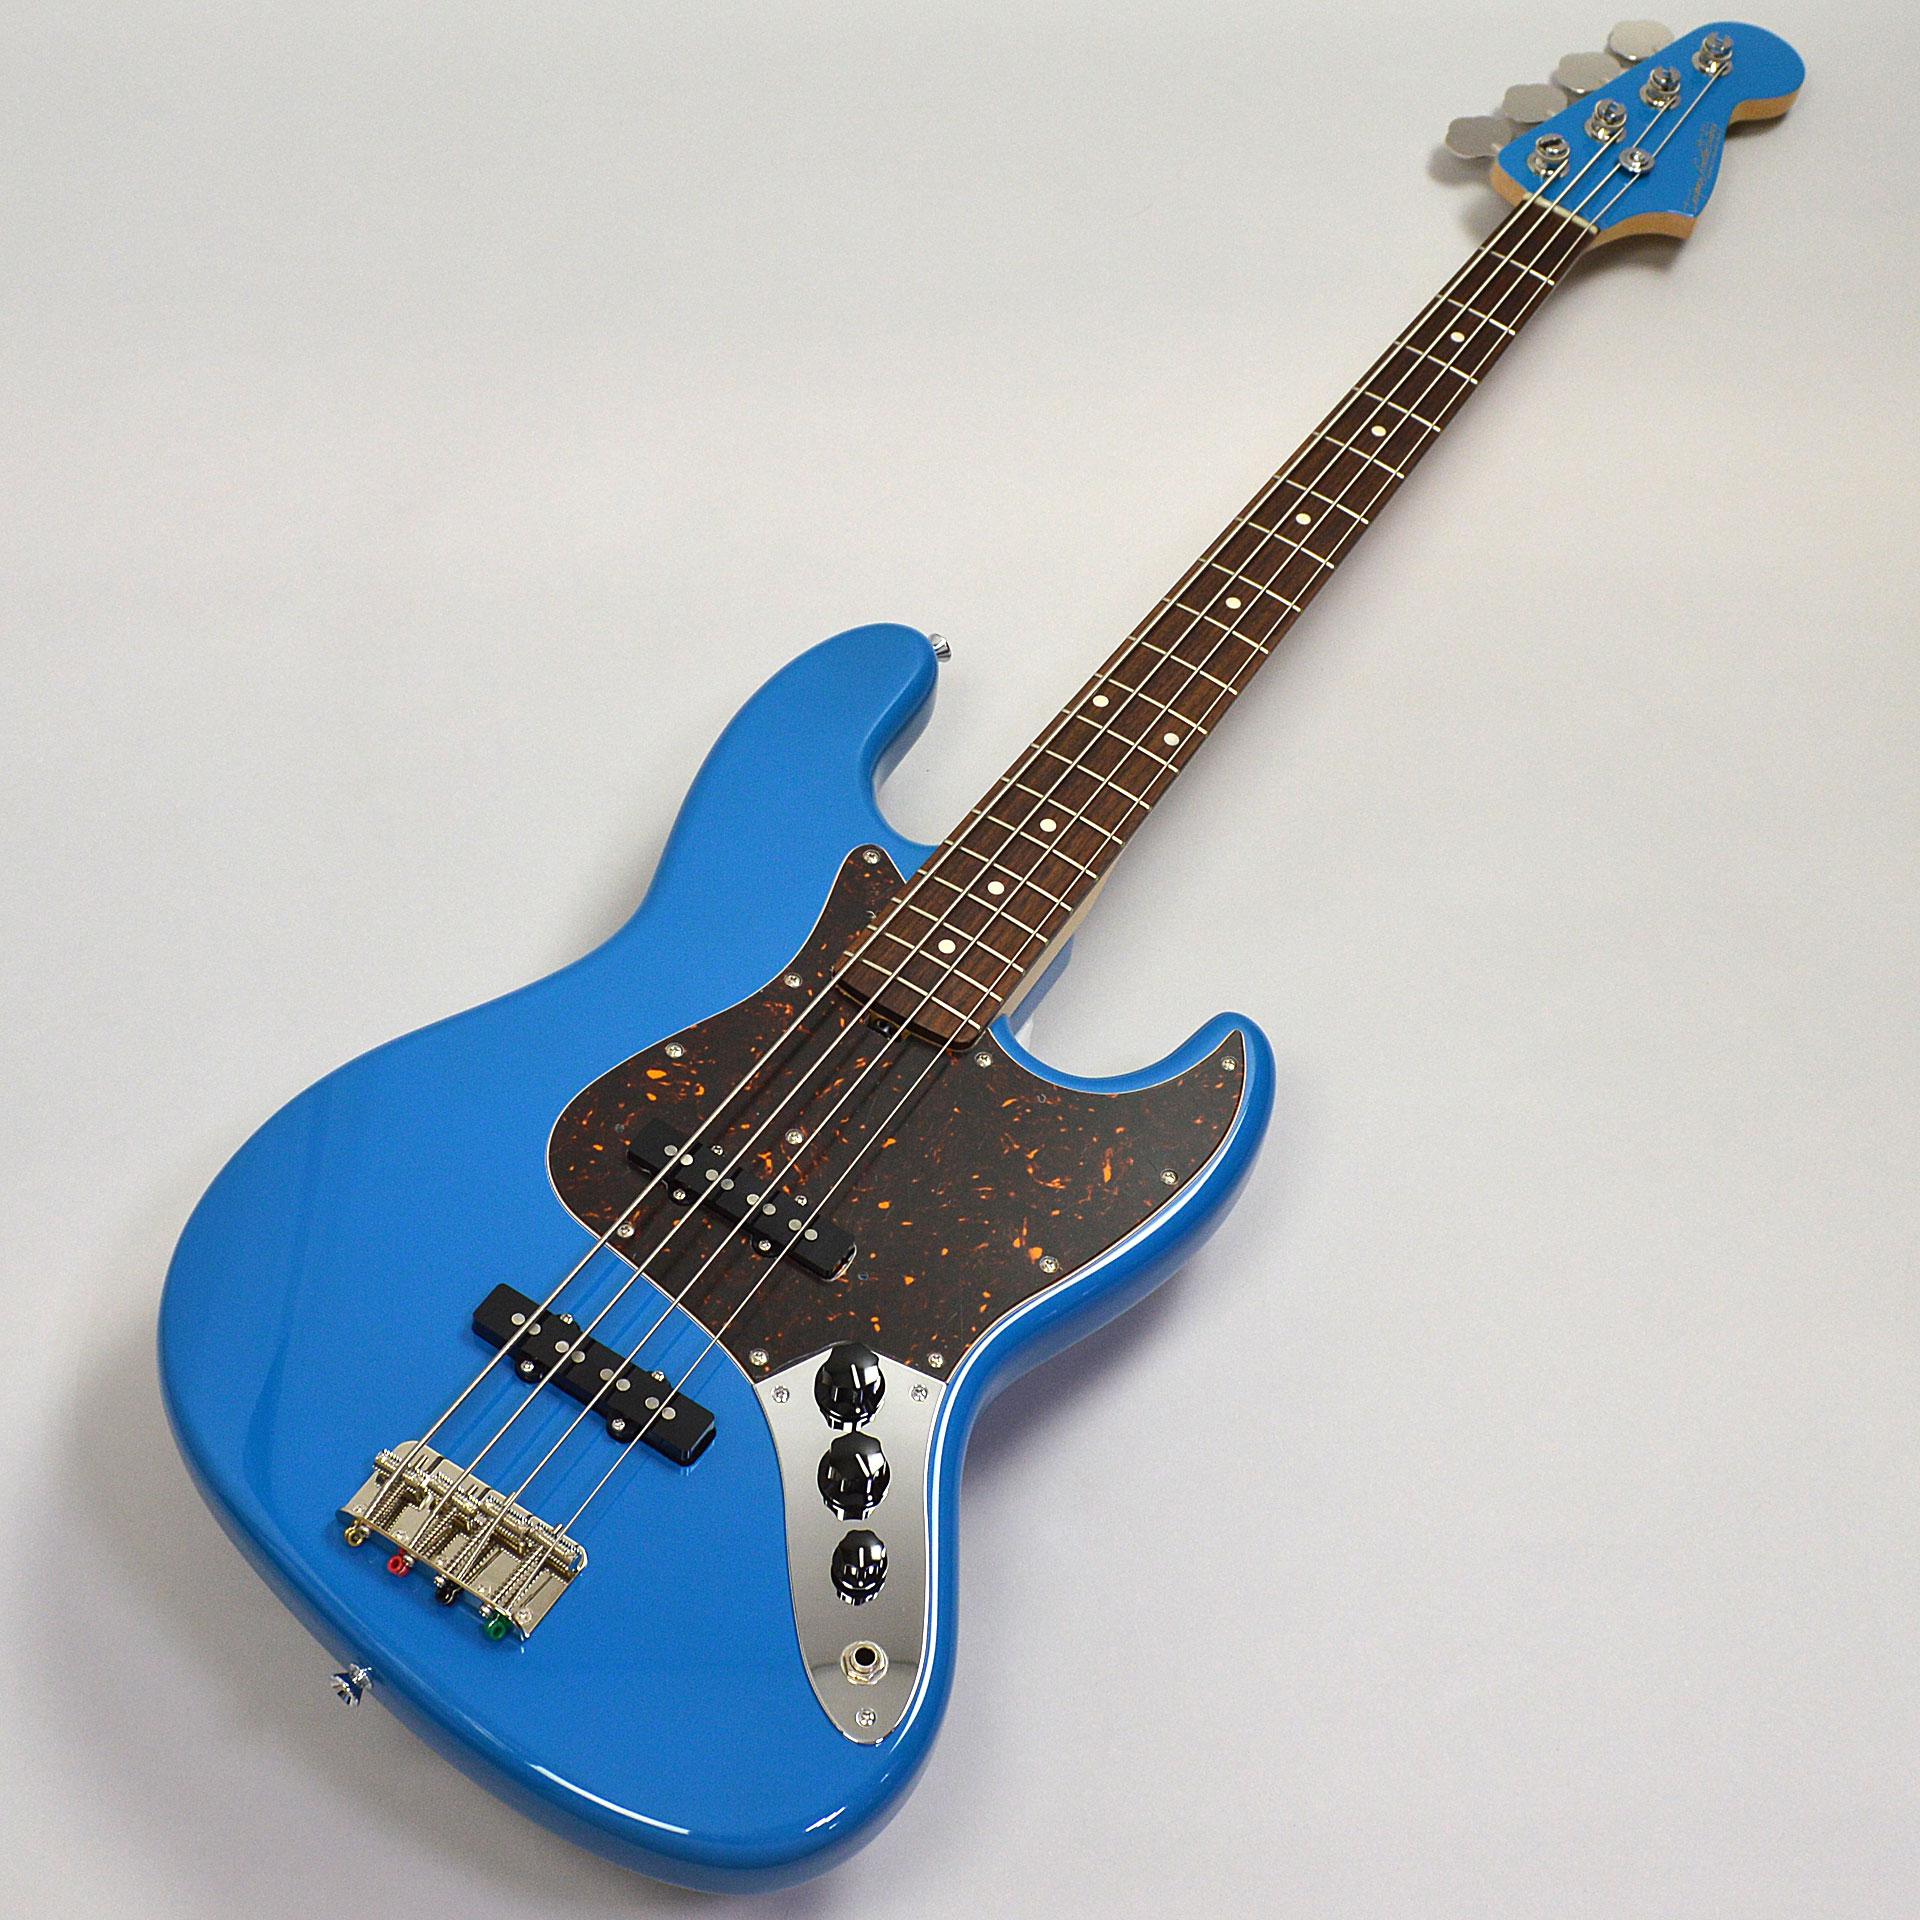 B21-J Al/L/Ash/Cobalt Blueの全体画像(縦)